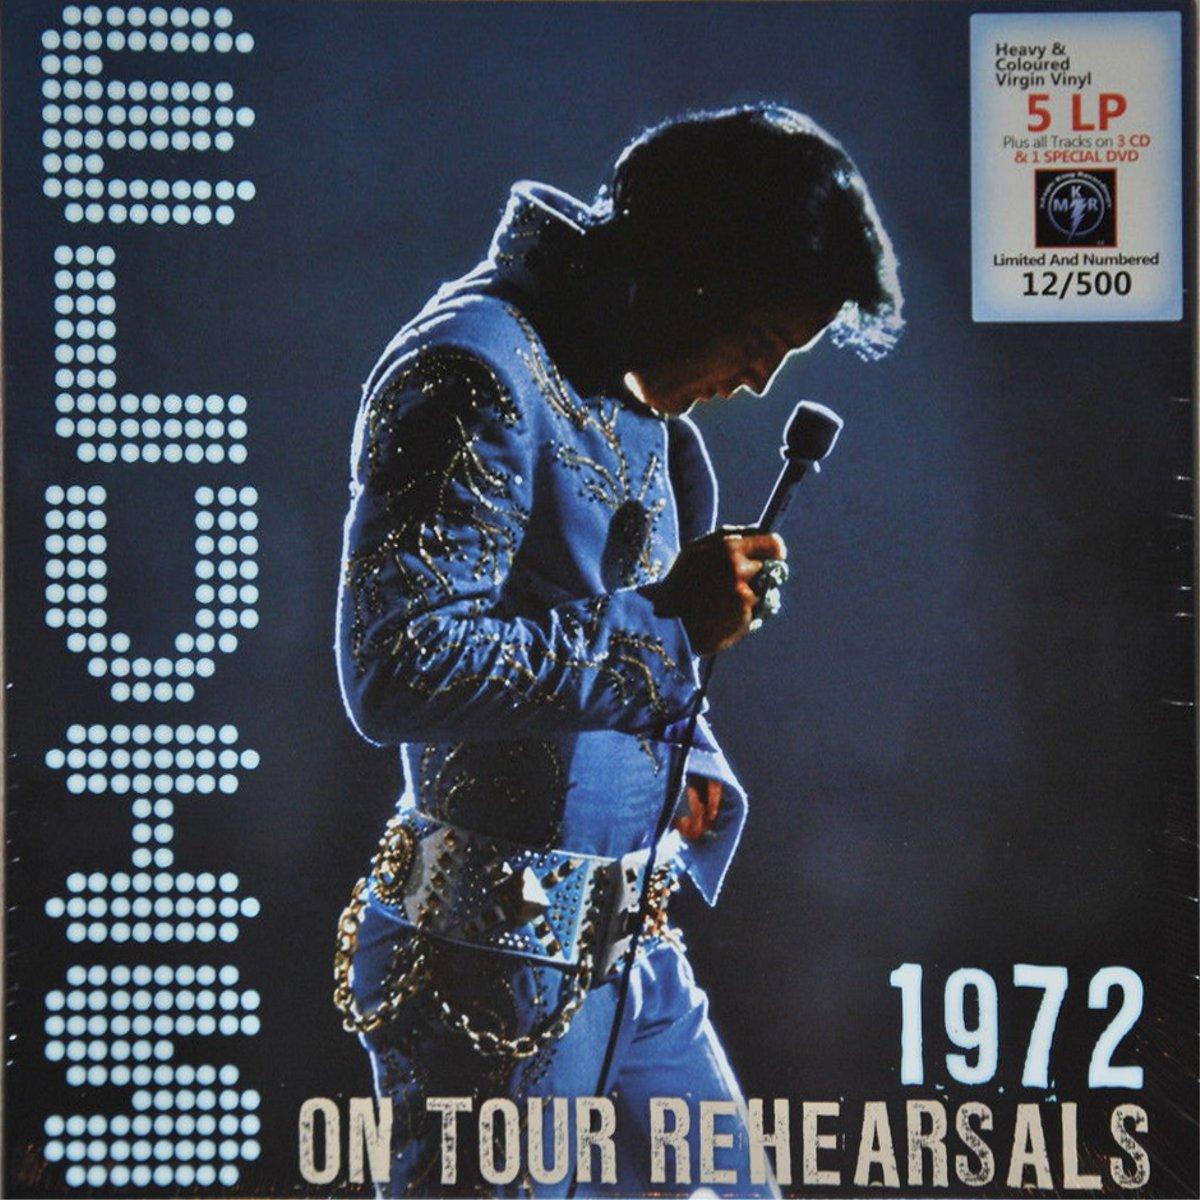 Elvis On Tour Rehearsals: 1972 01p6eho